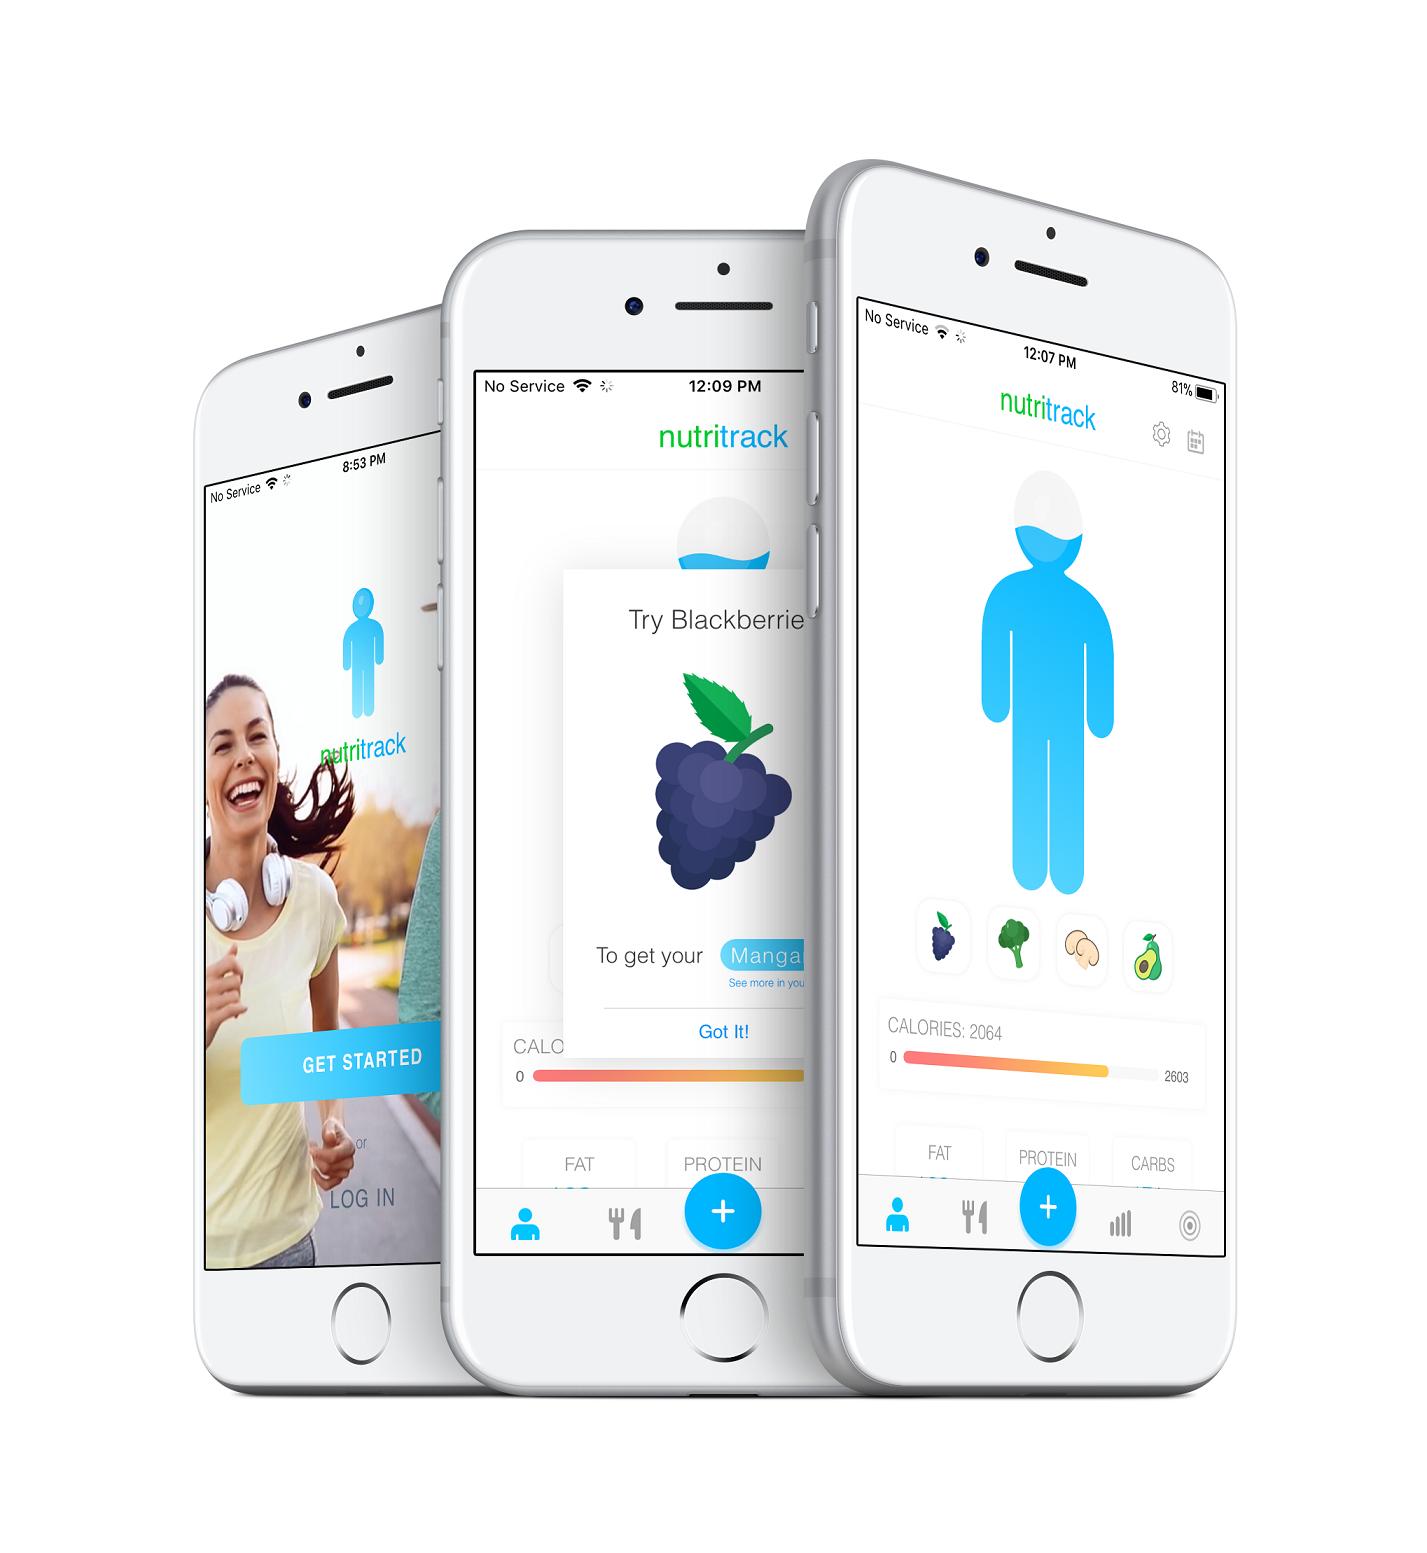 Pin by Nutritrack App on Nutritrack App in 2019